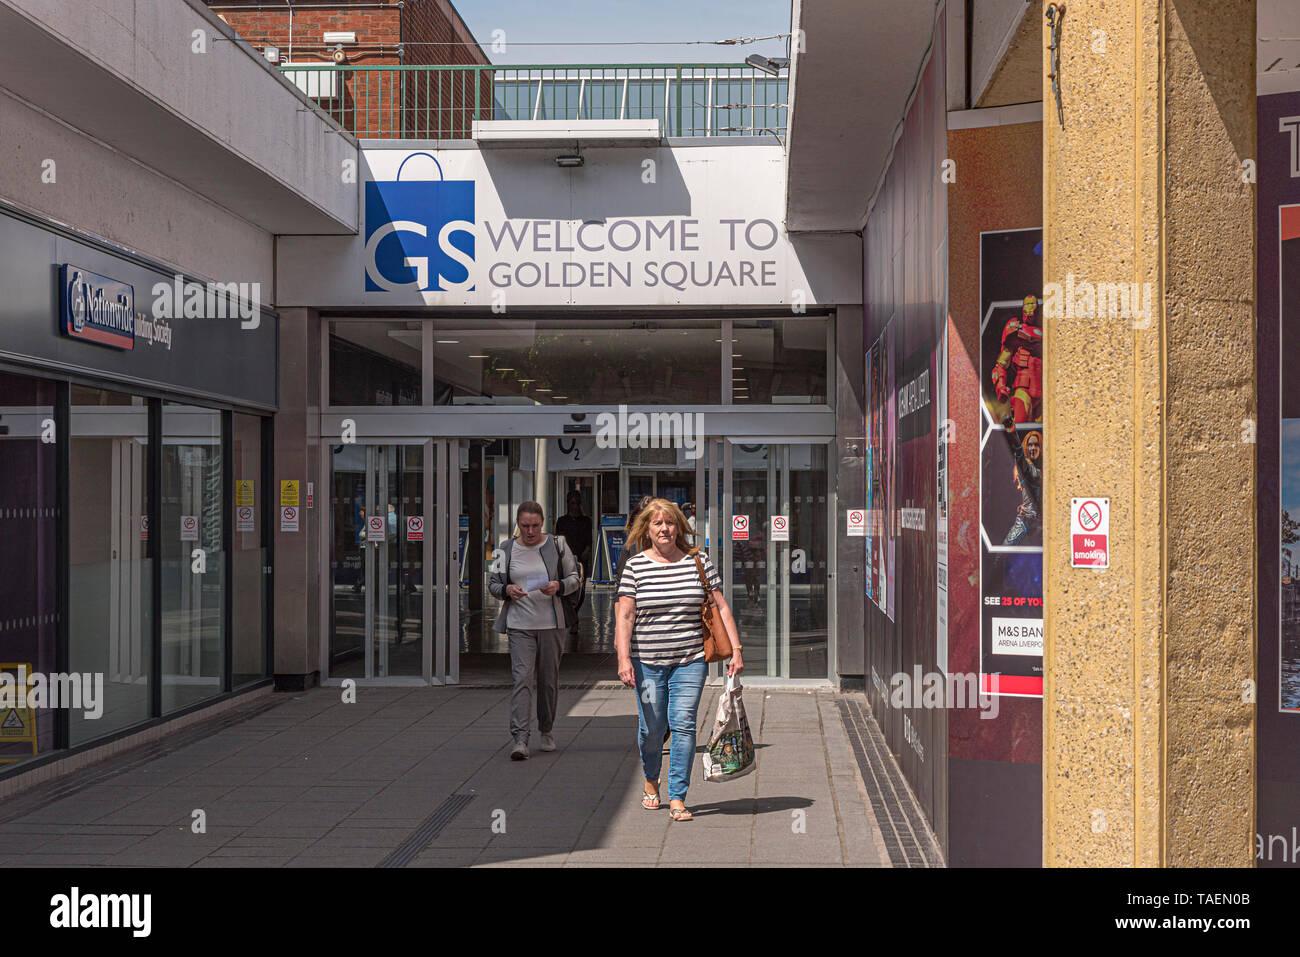 Warrington town centre. Golden Square shopping centre. - Stock Image